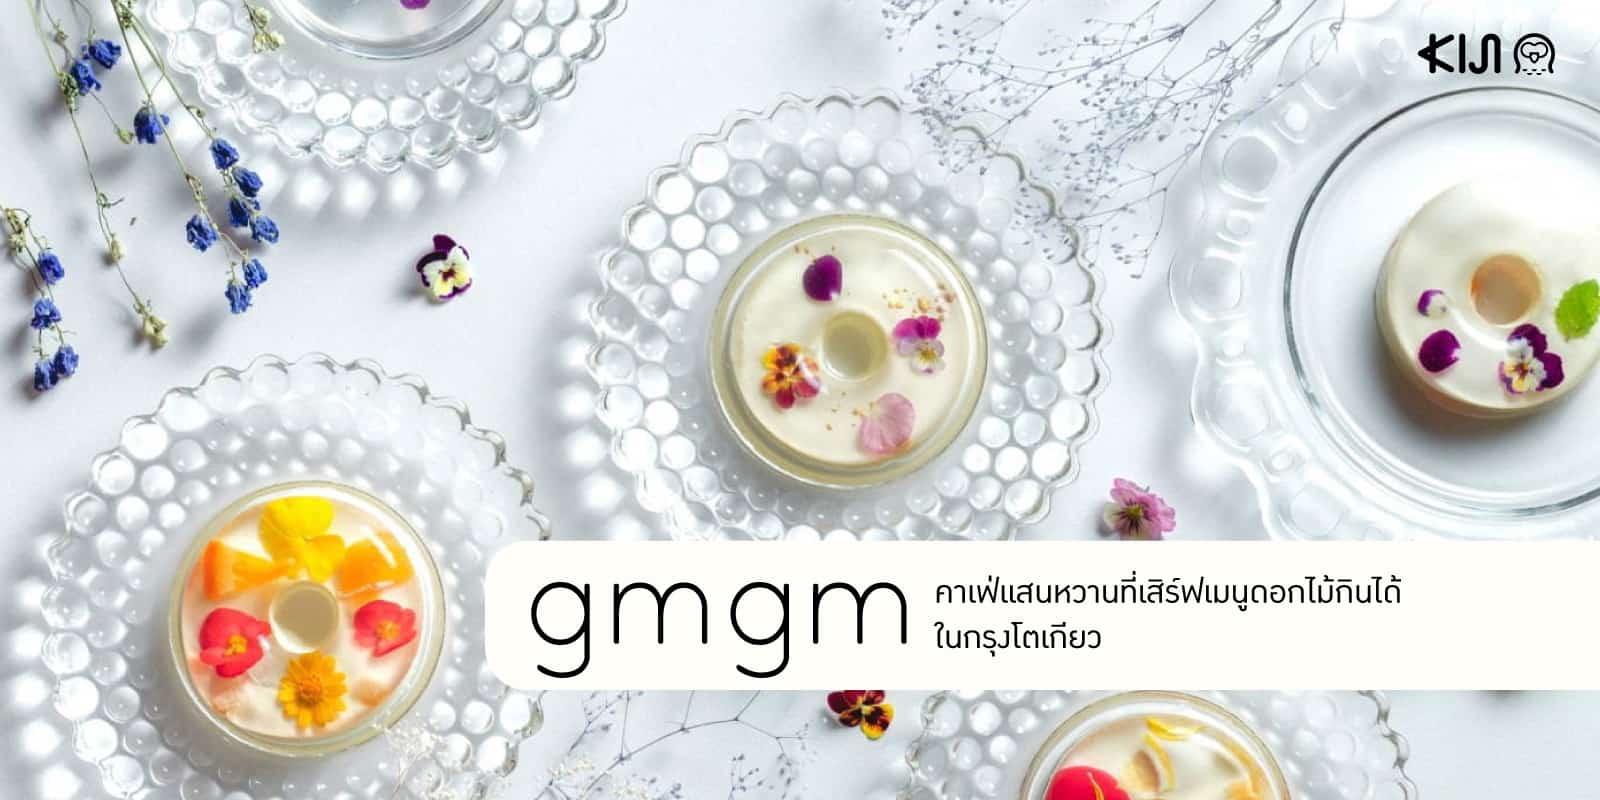 gmgm (グムグム) คาเฟ่ดอกไม้ โตเกียว